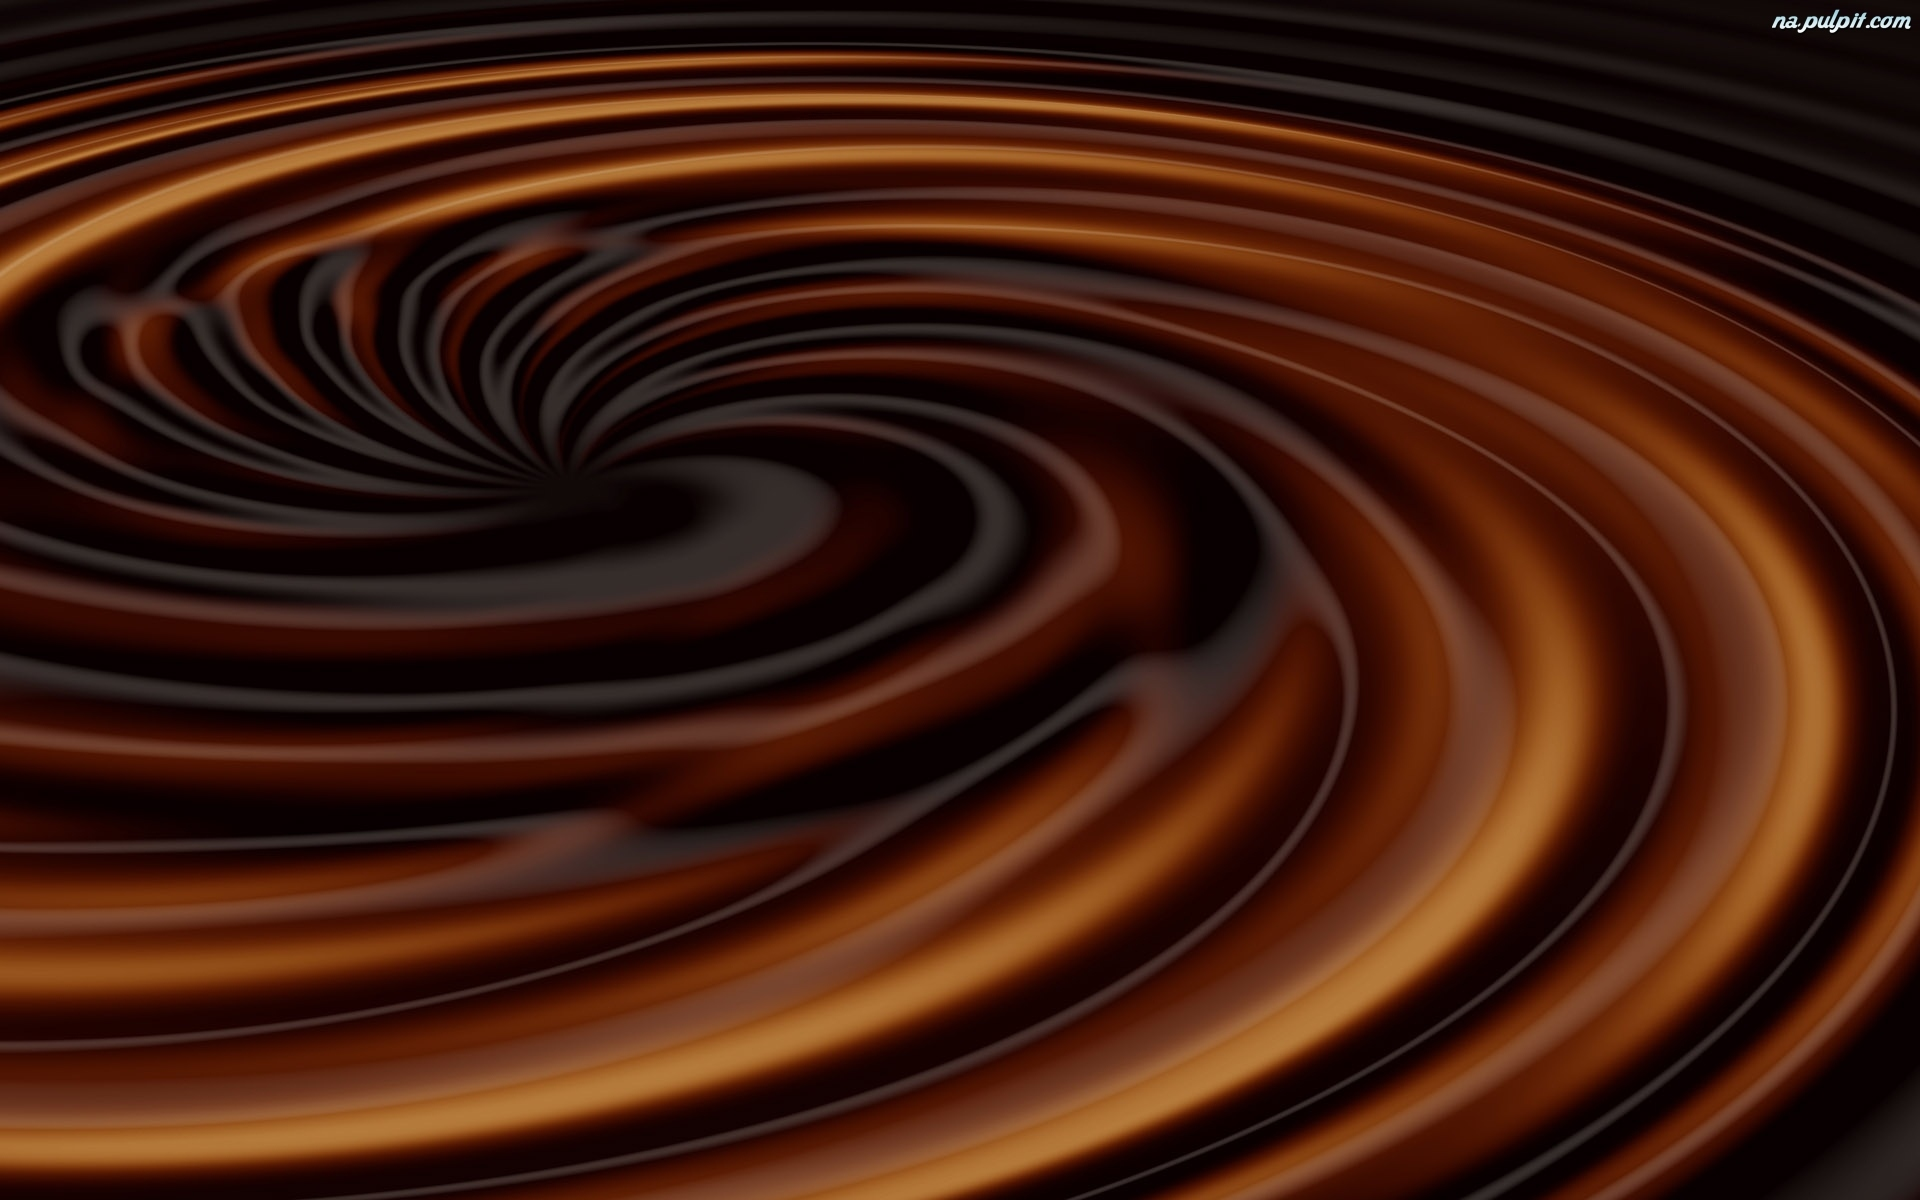 Cadbury Chocolate Wallpapers 3 High Resolution Wallpaper 1920x1200